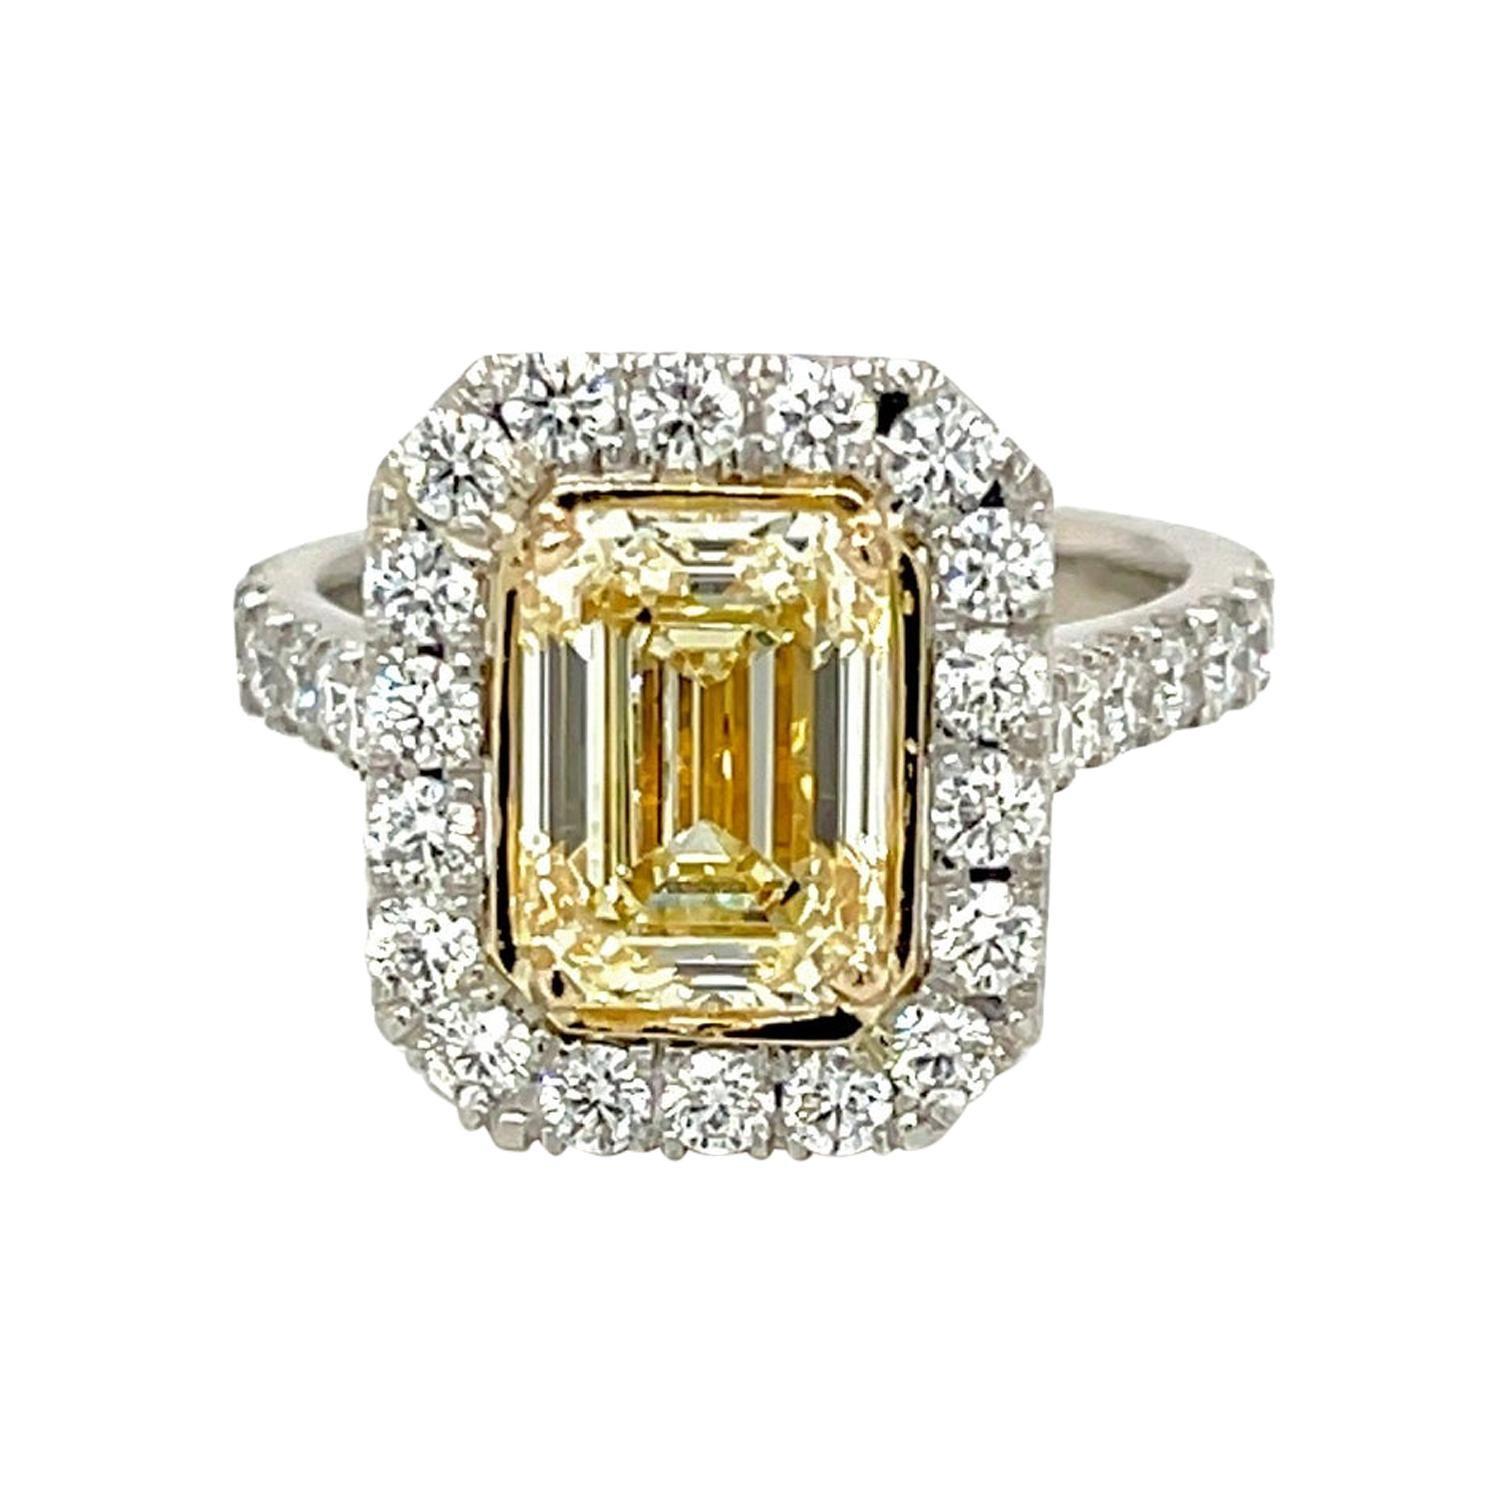 Emerald Cut Yellow Diamond Ring 2.70 Carats Plat/18KY GIA Certified